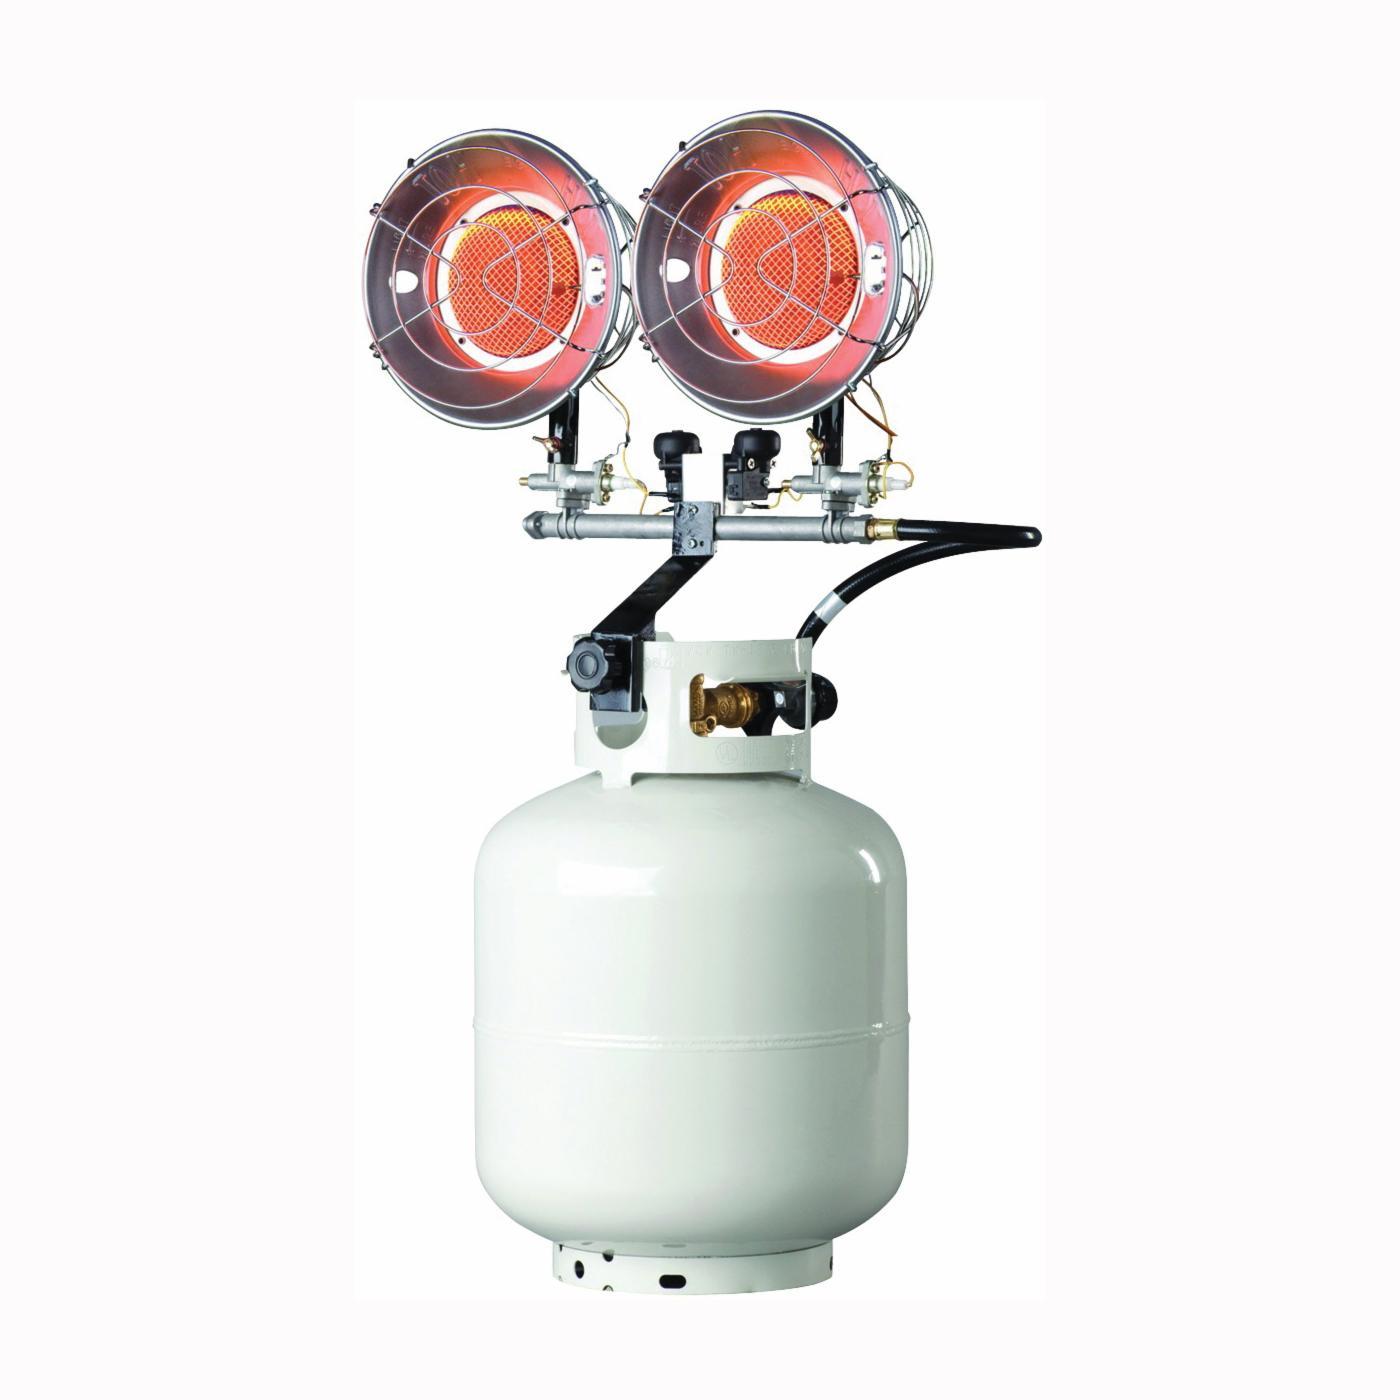 Mr. Heater F242650/600